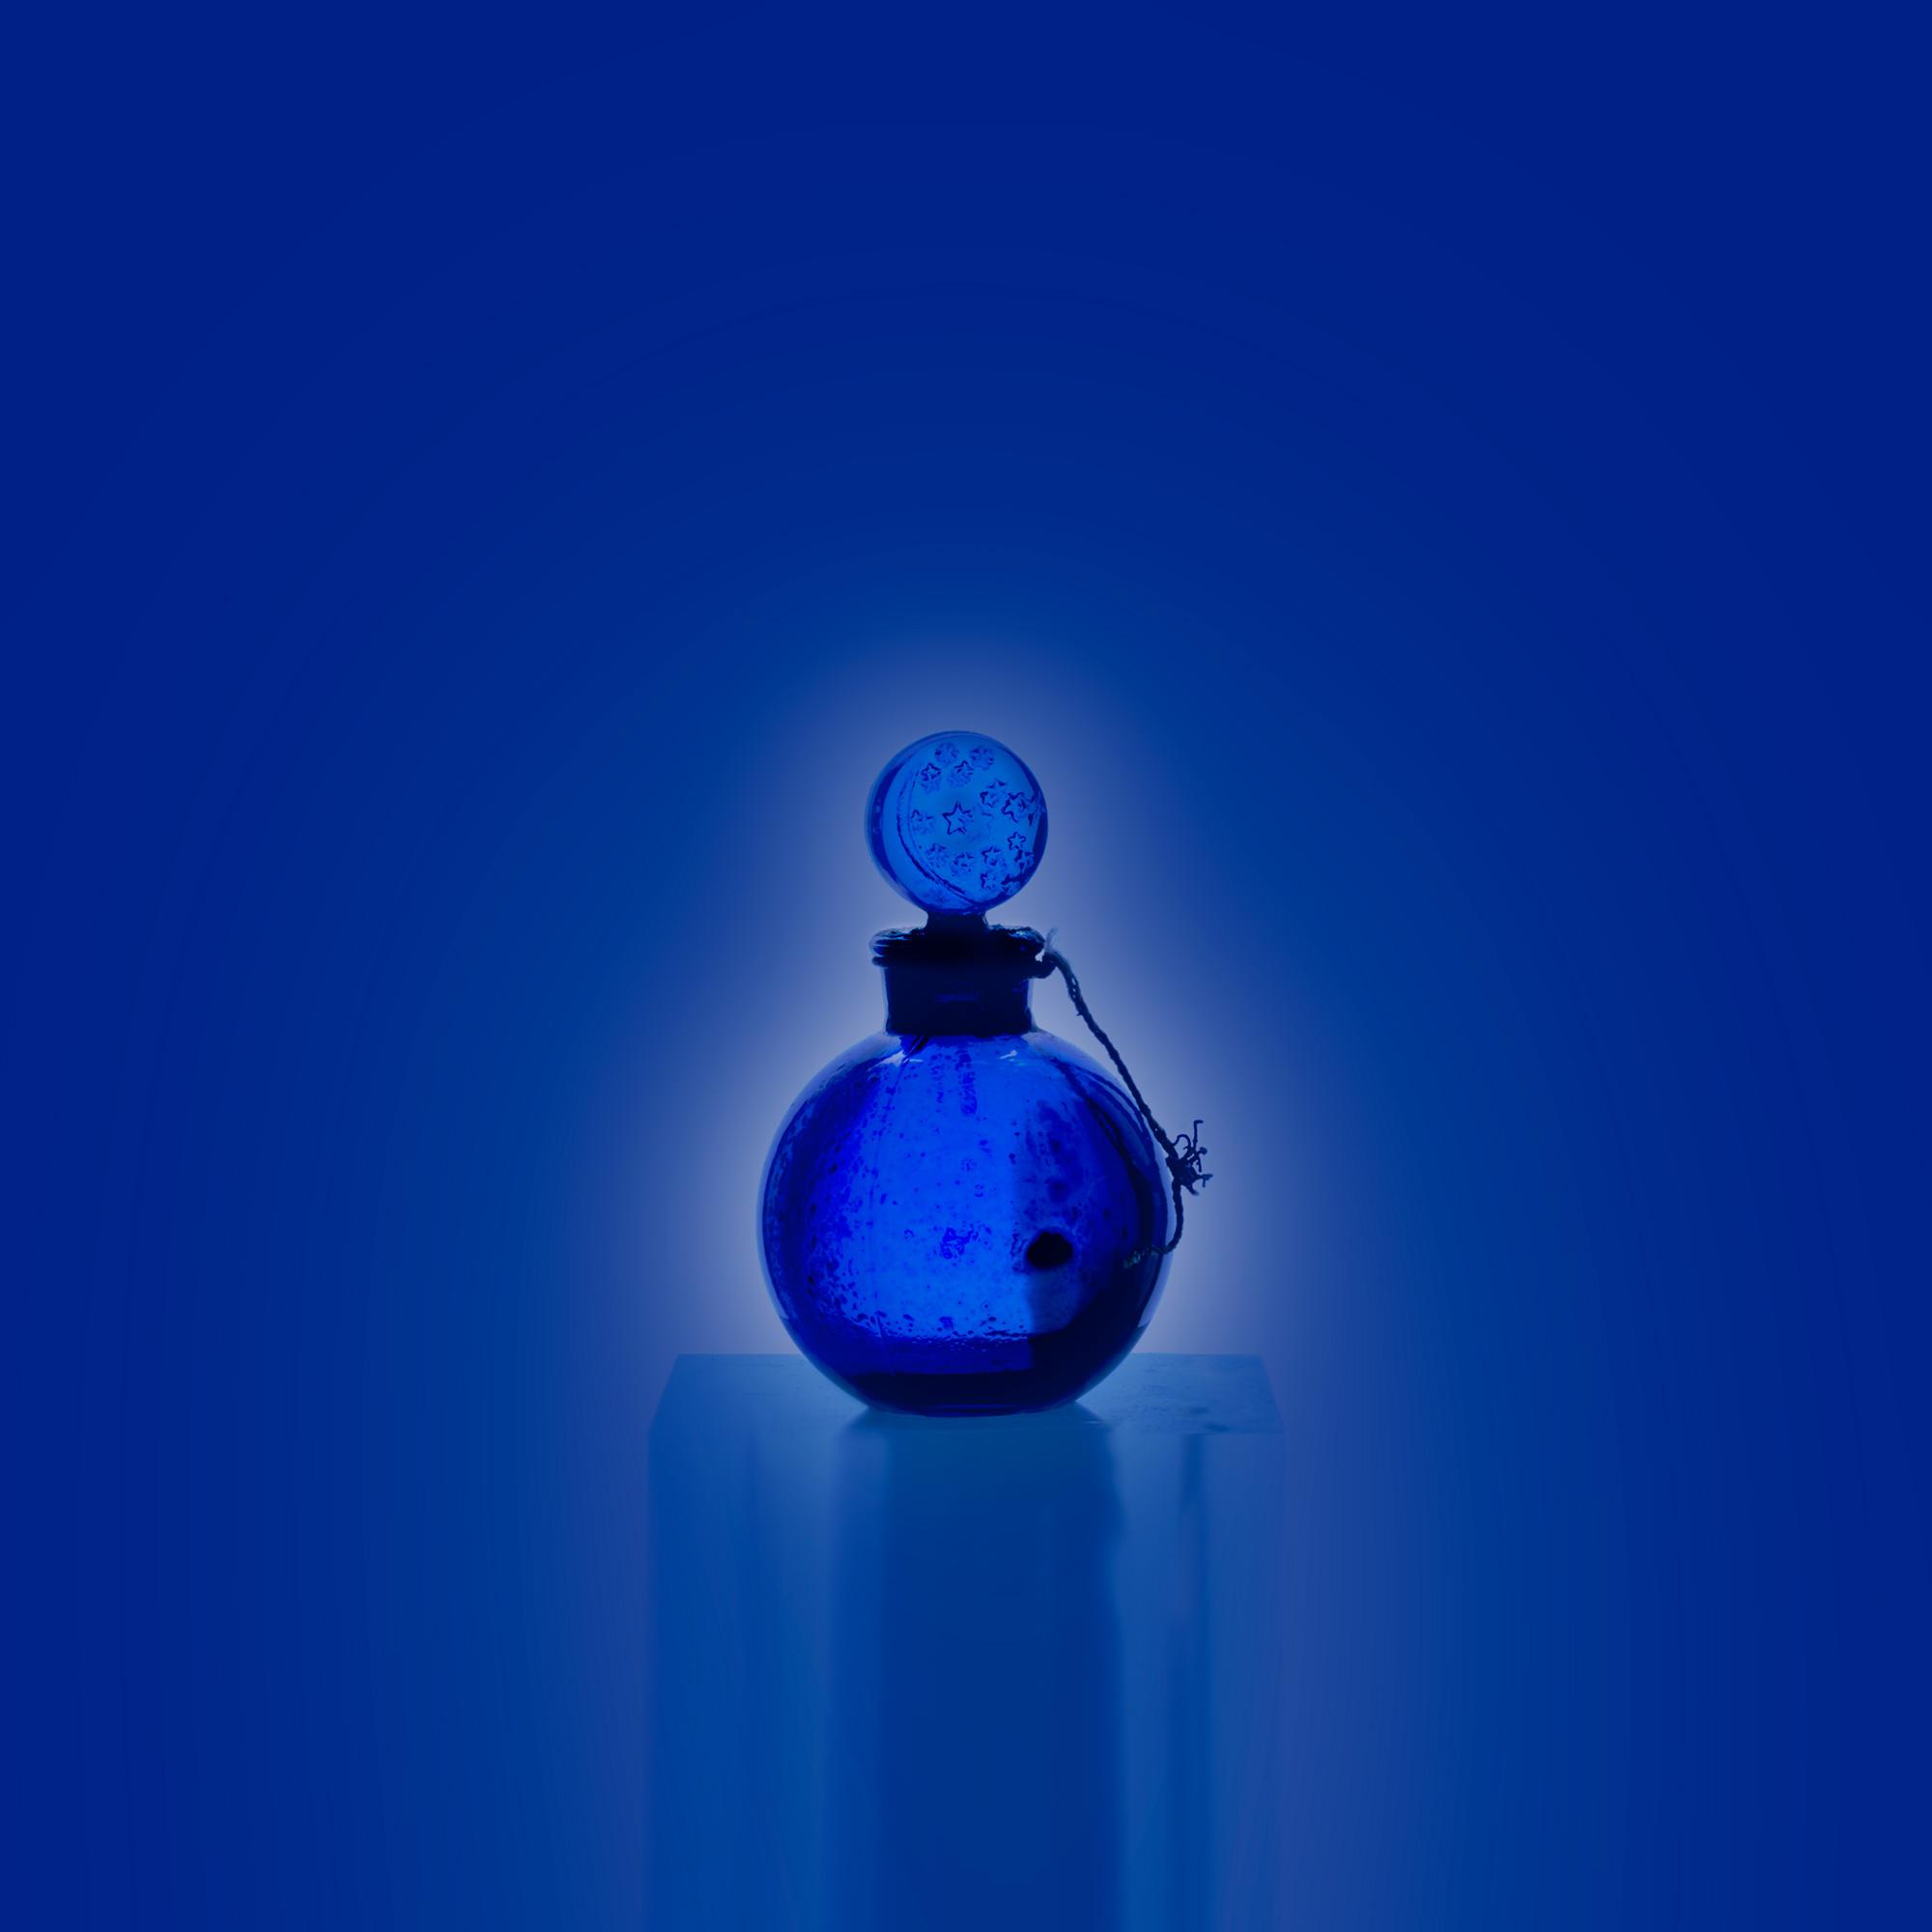 Small Bottles Blue 2, 2017